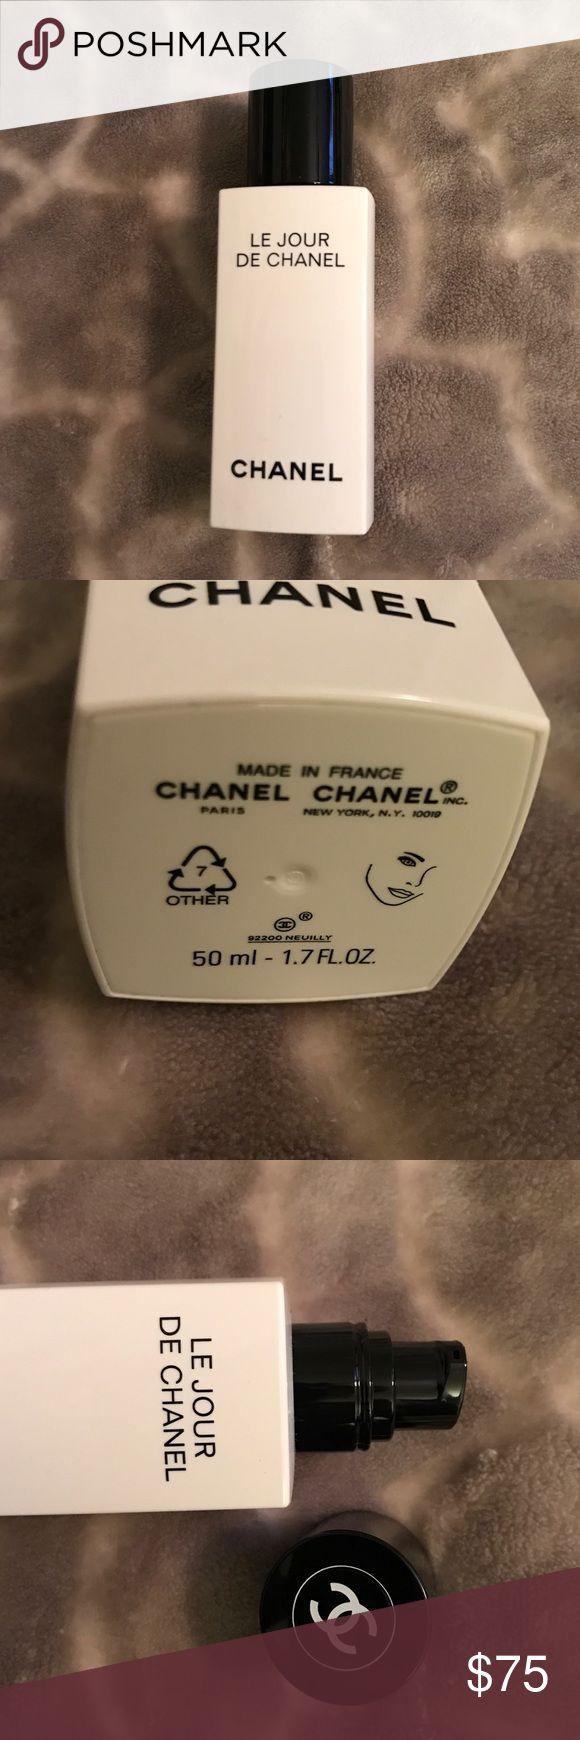 Authentic Chanel Le jour Authentic Chanel Le Jour De Chanel CHANEL Makeup